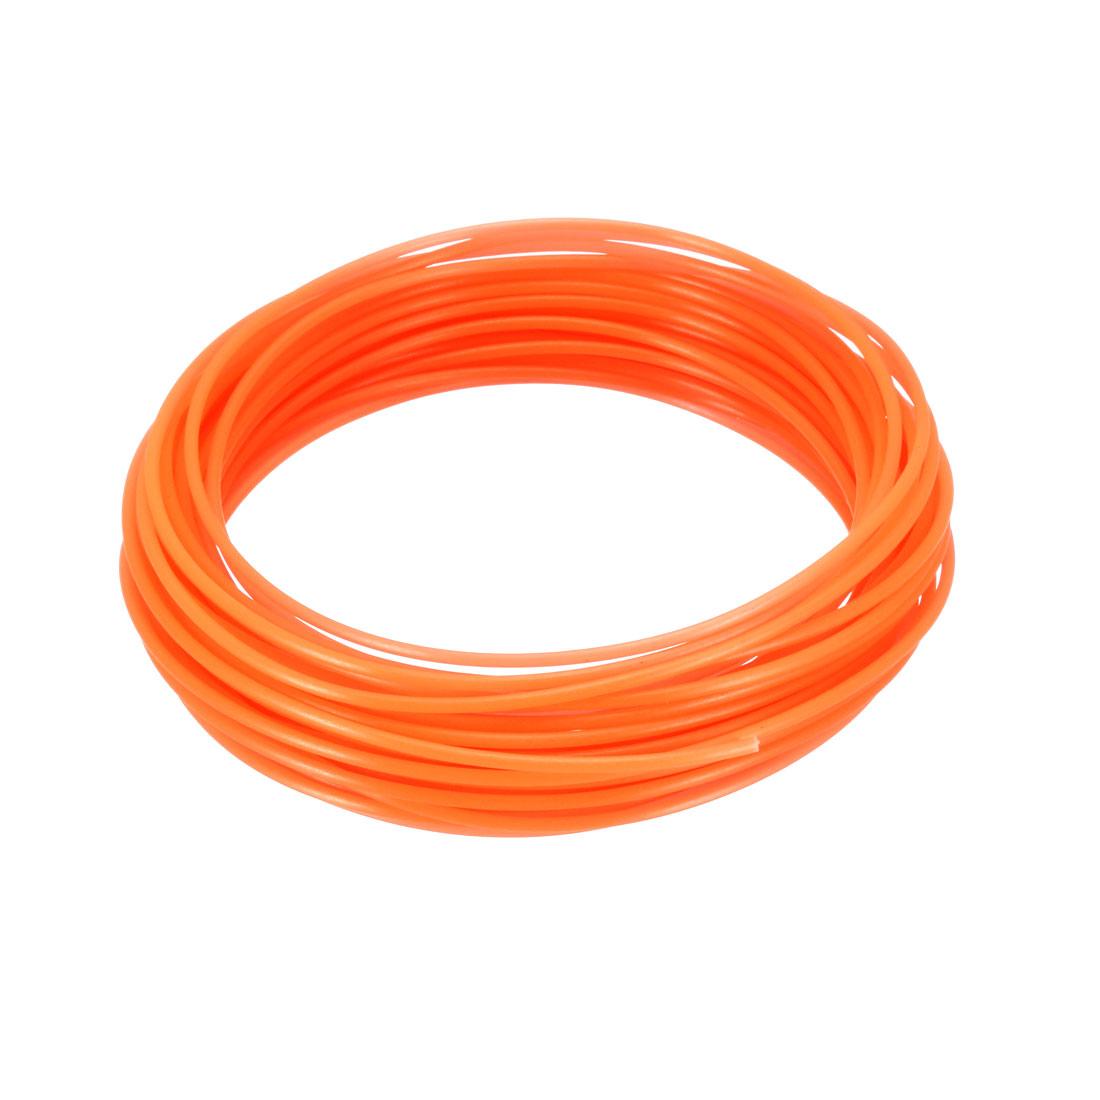 10 Meter/32.5 Ft PLA 3D Pen/3D Printer Filament, 1.75 mm Luminous Orange